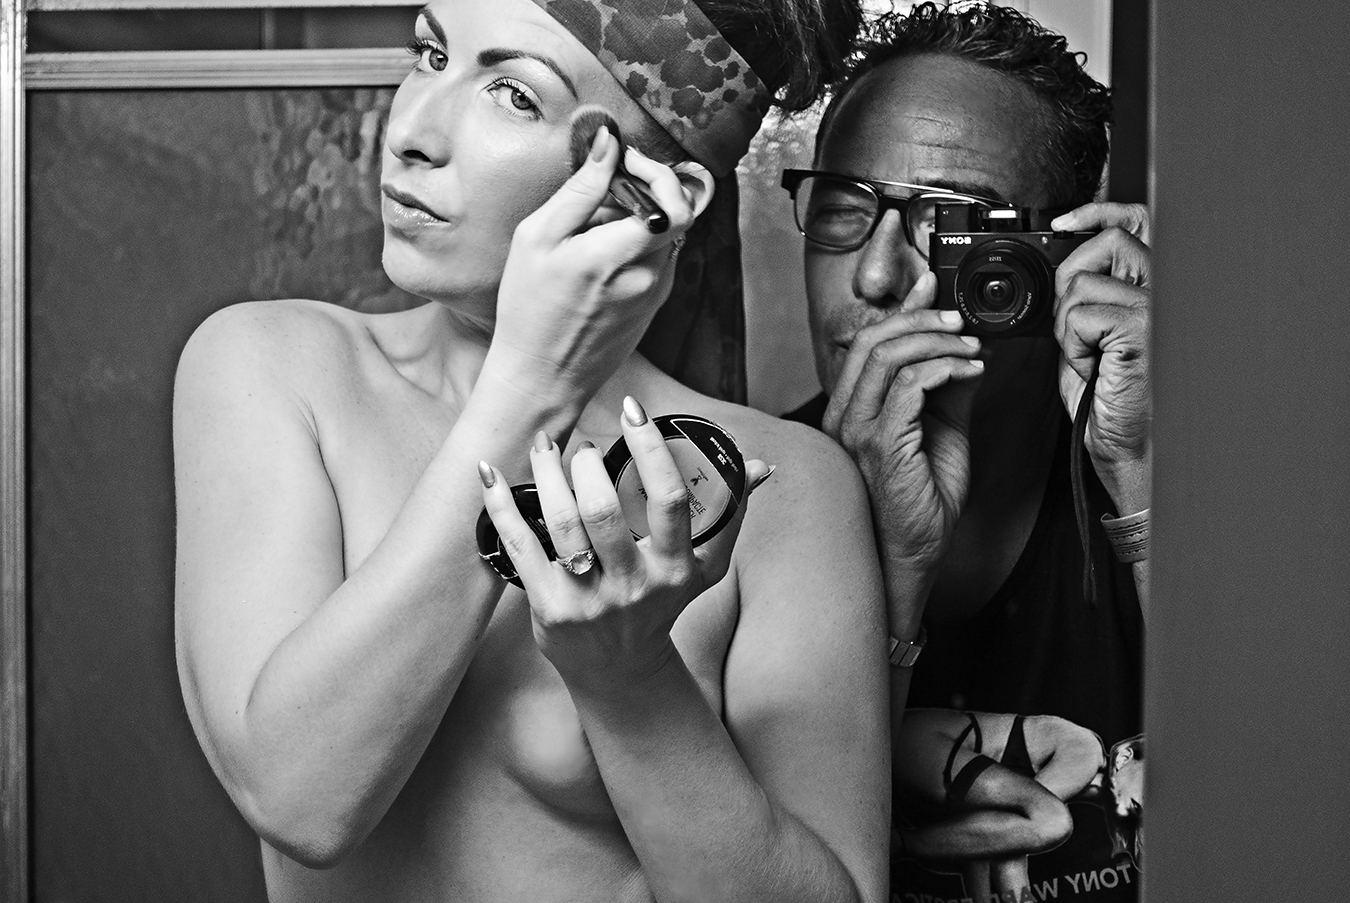 Tony_Ward_Studio_Katie_Kerl_nude_tattoos_piercings_erotic_makeup_art